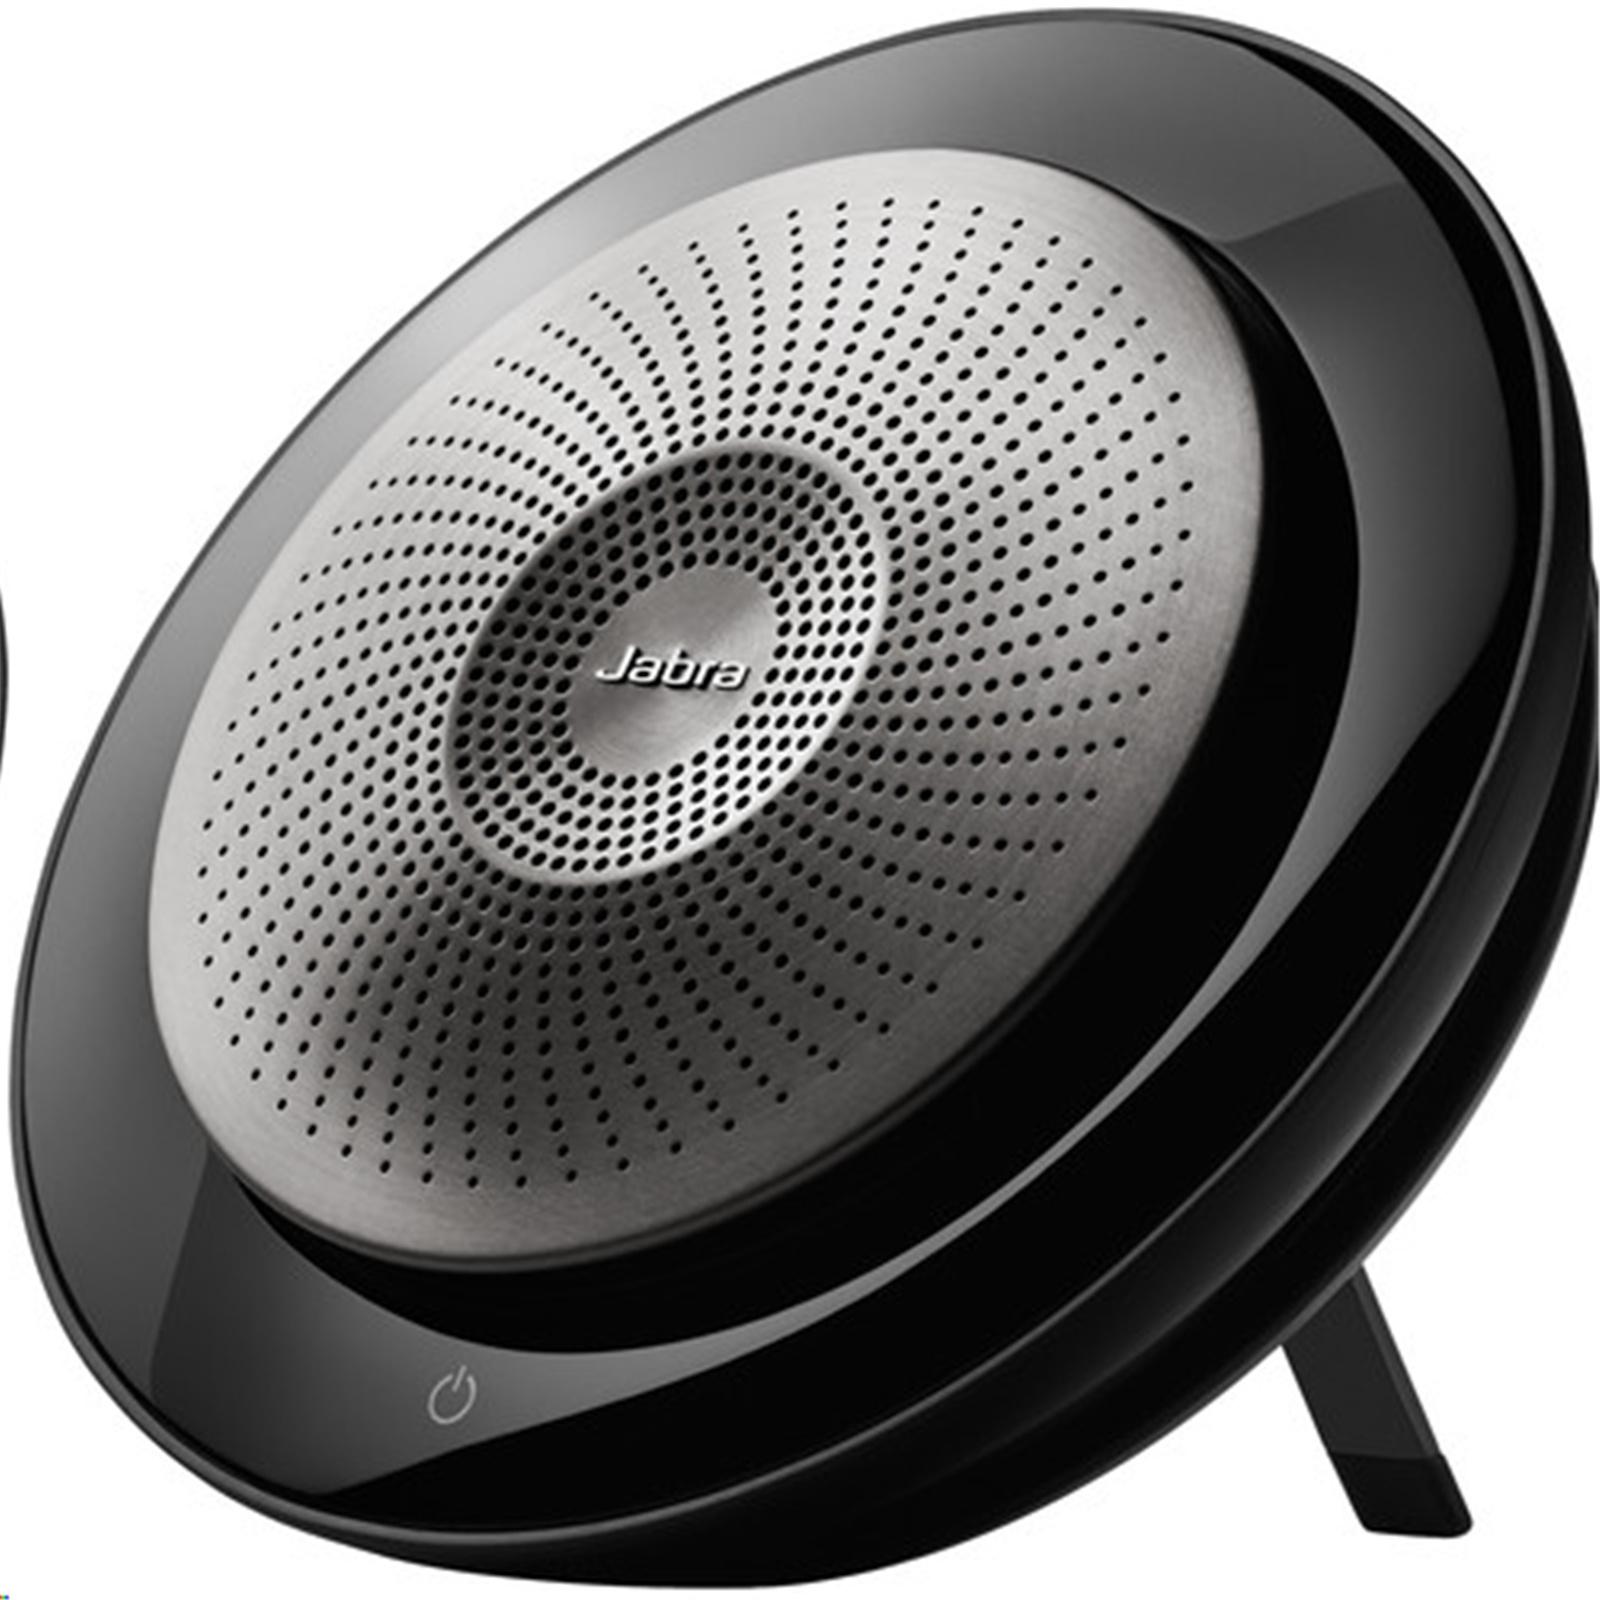 Buy The Jabra Speakerphone USB & Bluetooth With LINK 370